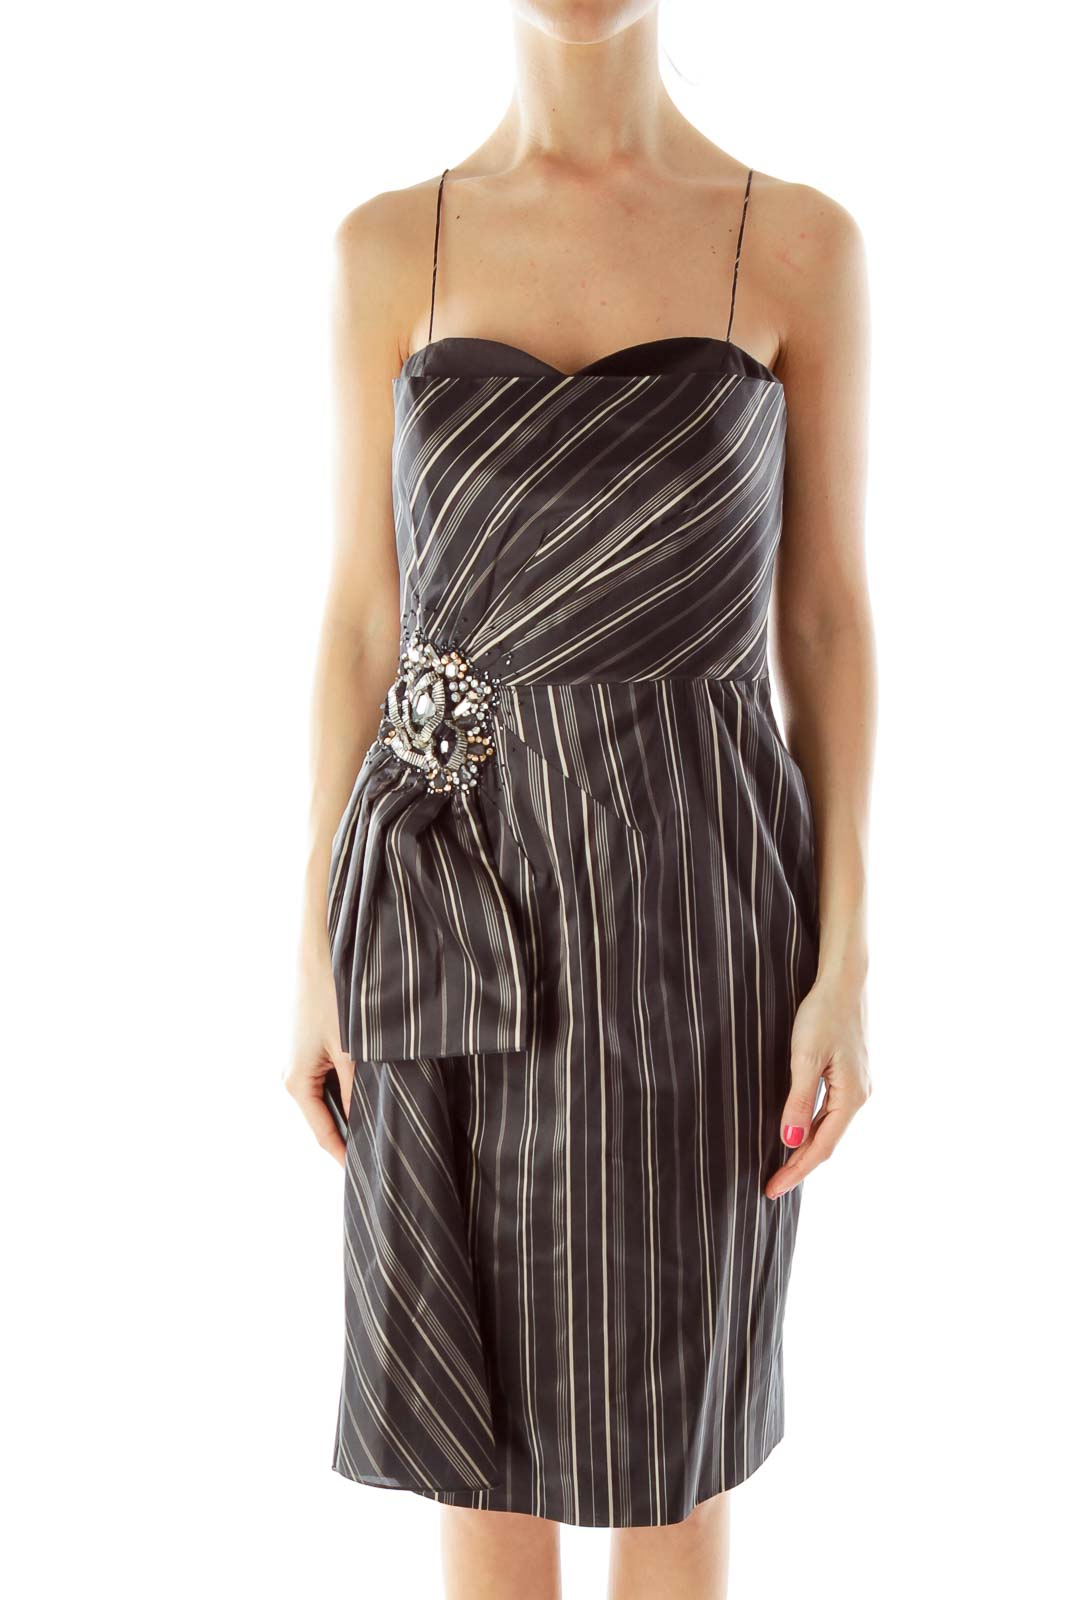 Black Pinstripe Beaded Cocktail Dress